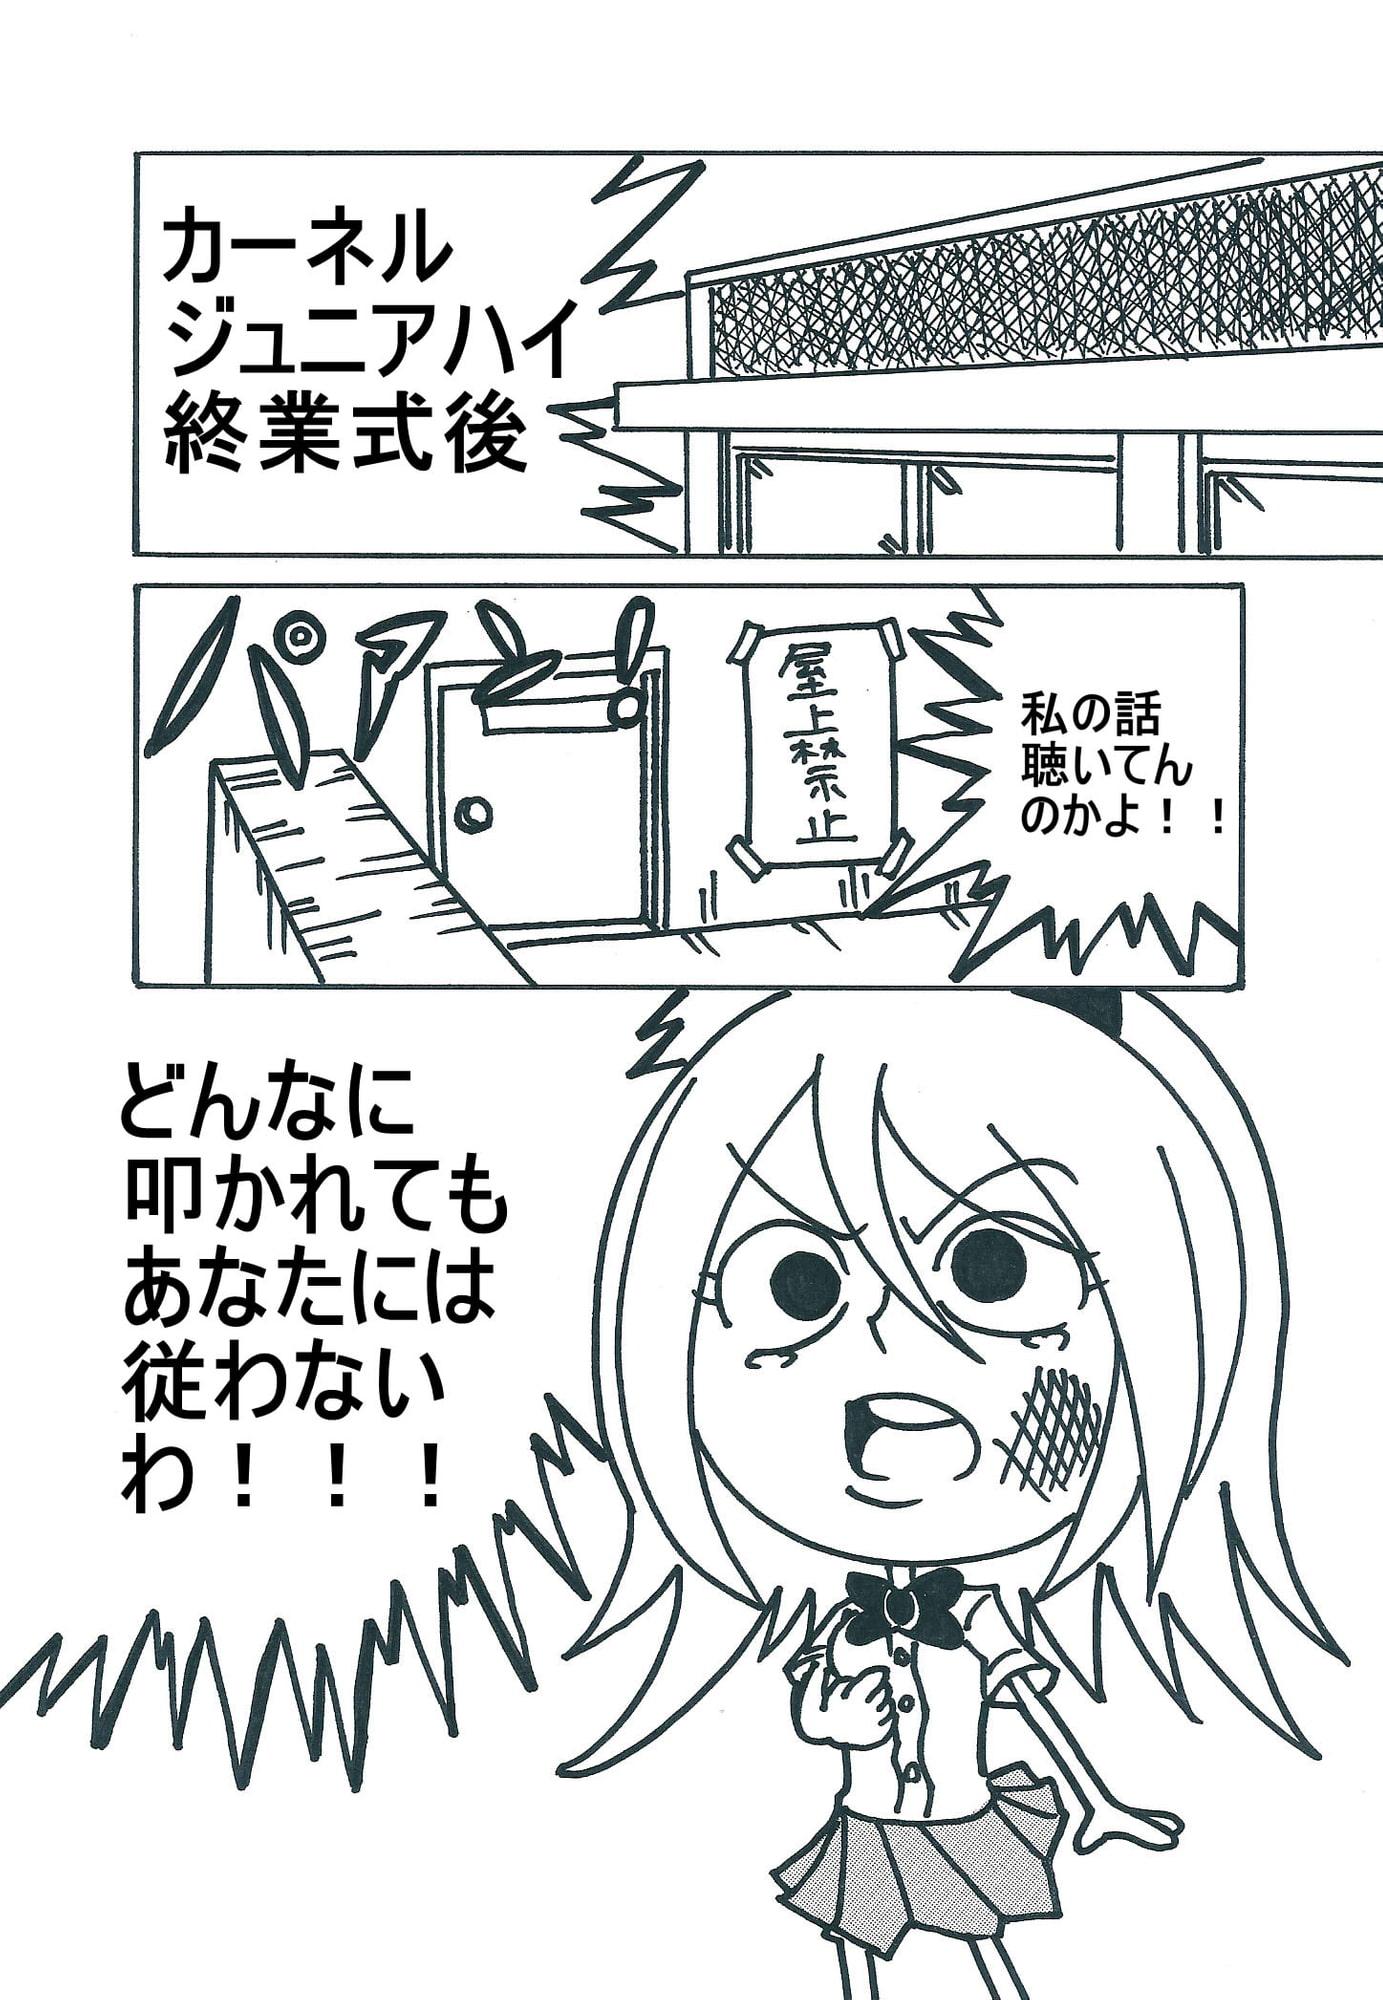 DLsite専売Cartoon set